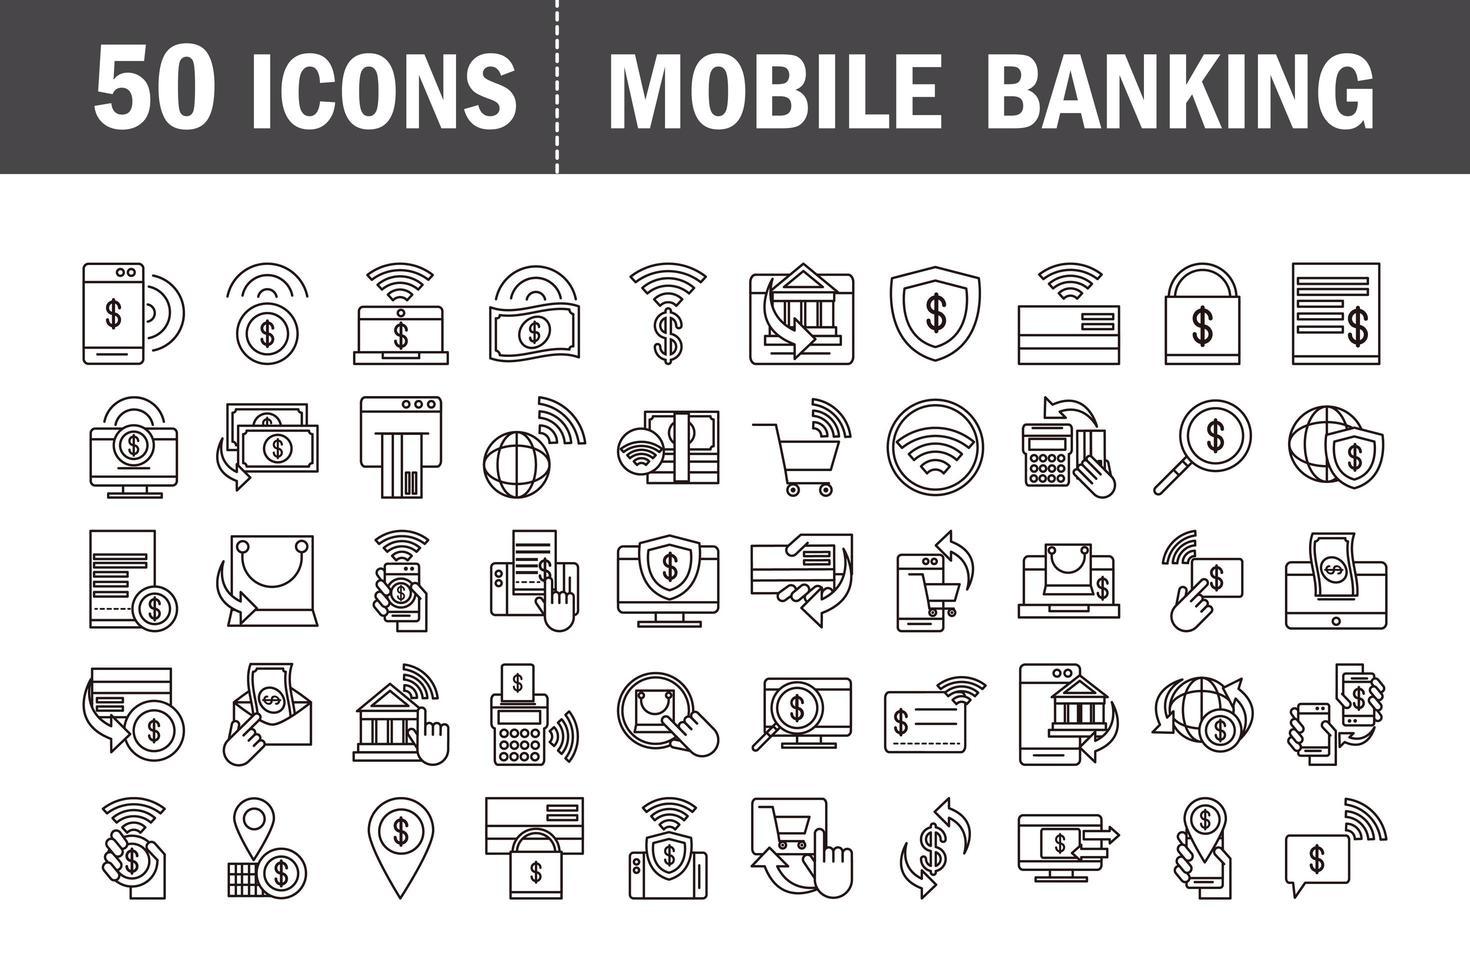 conjunto de ícones de pictograma de banco móvel e comércio eletrônico vetor